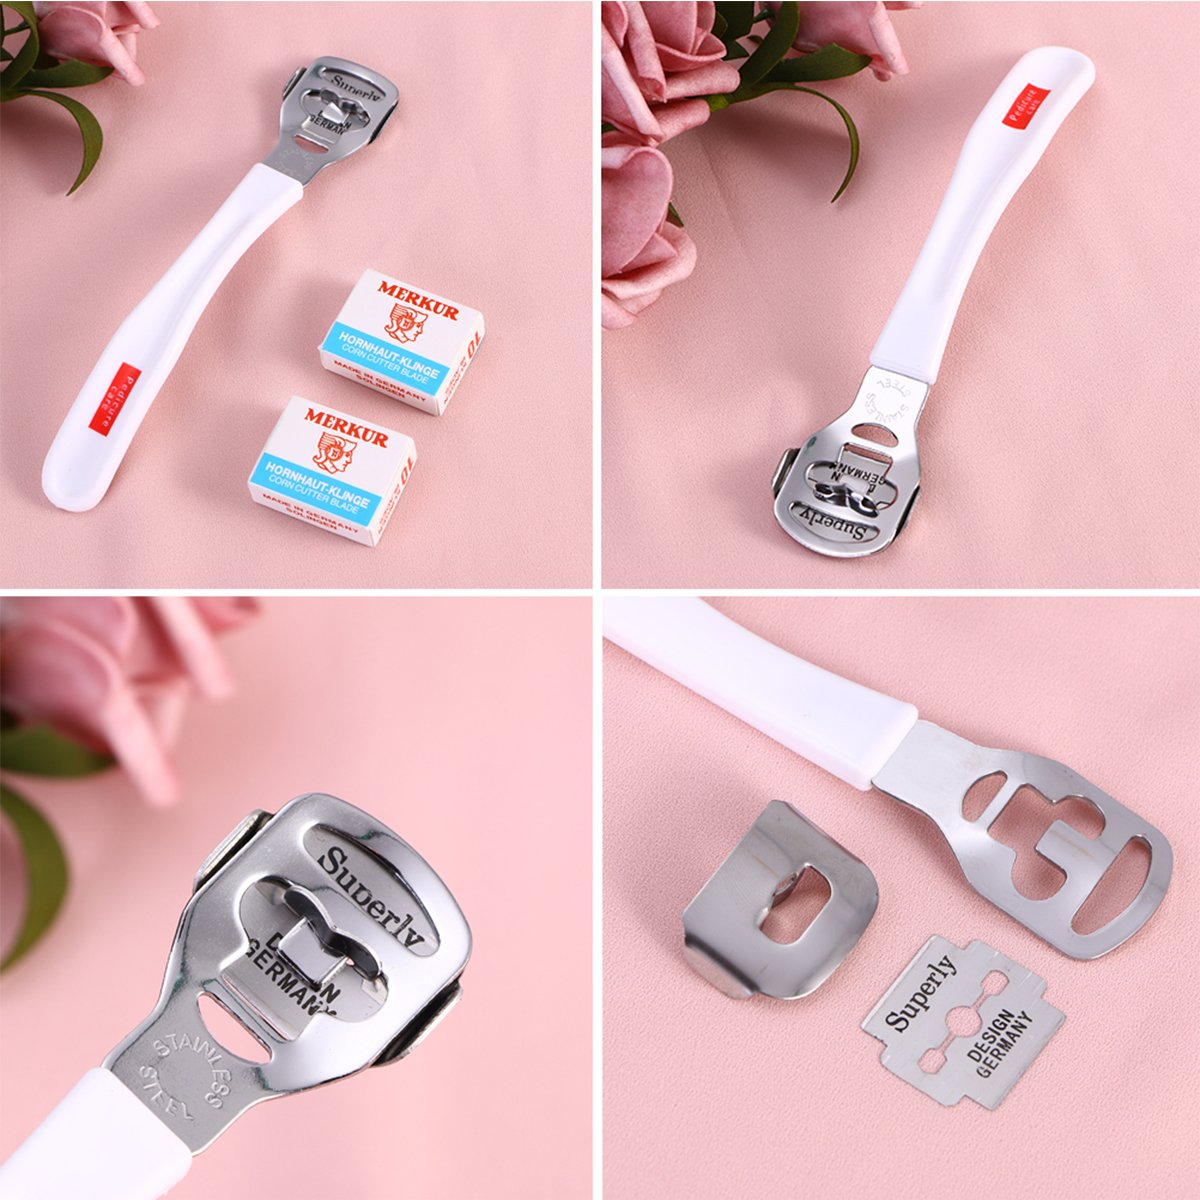 Foot Callus Remover Callus Shaver Cutter Hard Skin Remover Callus Remover Tool with 20 Blades